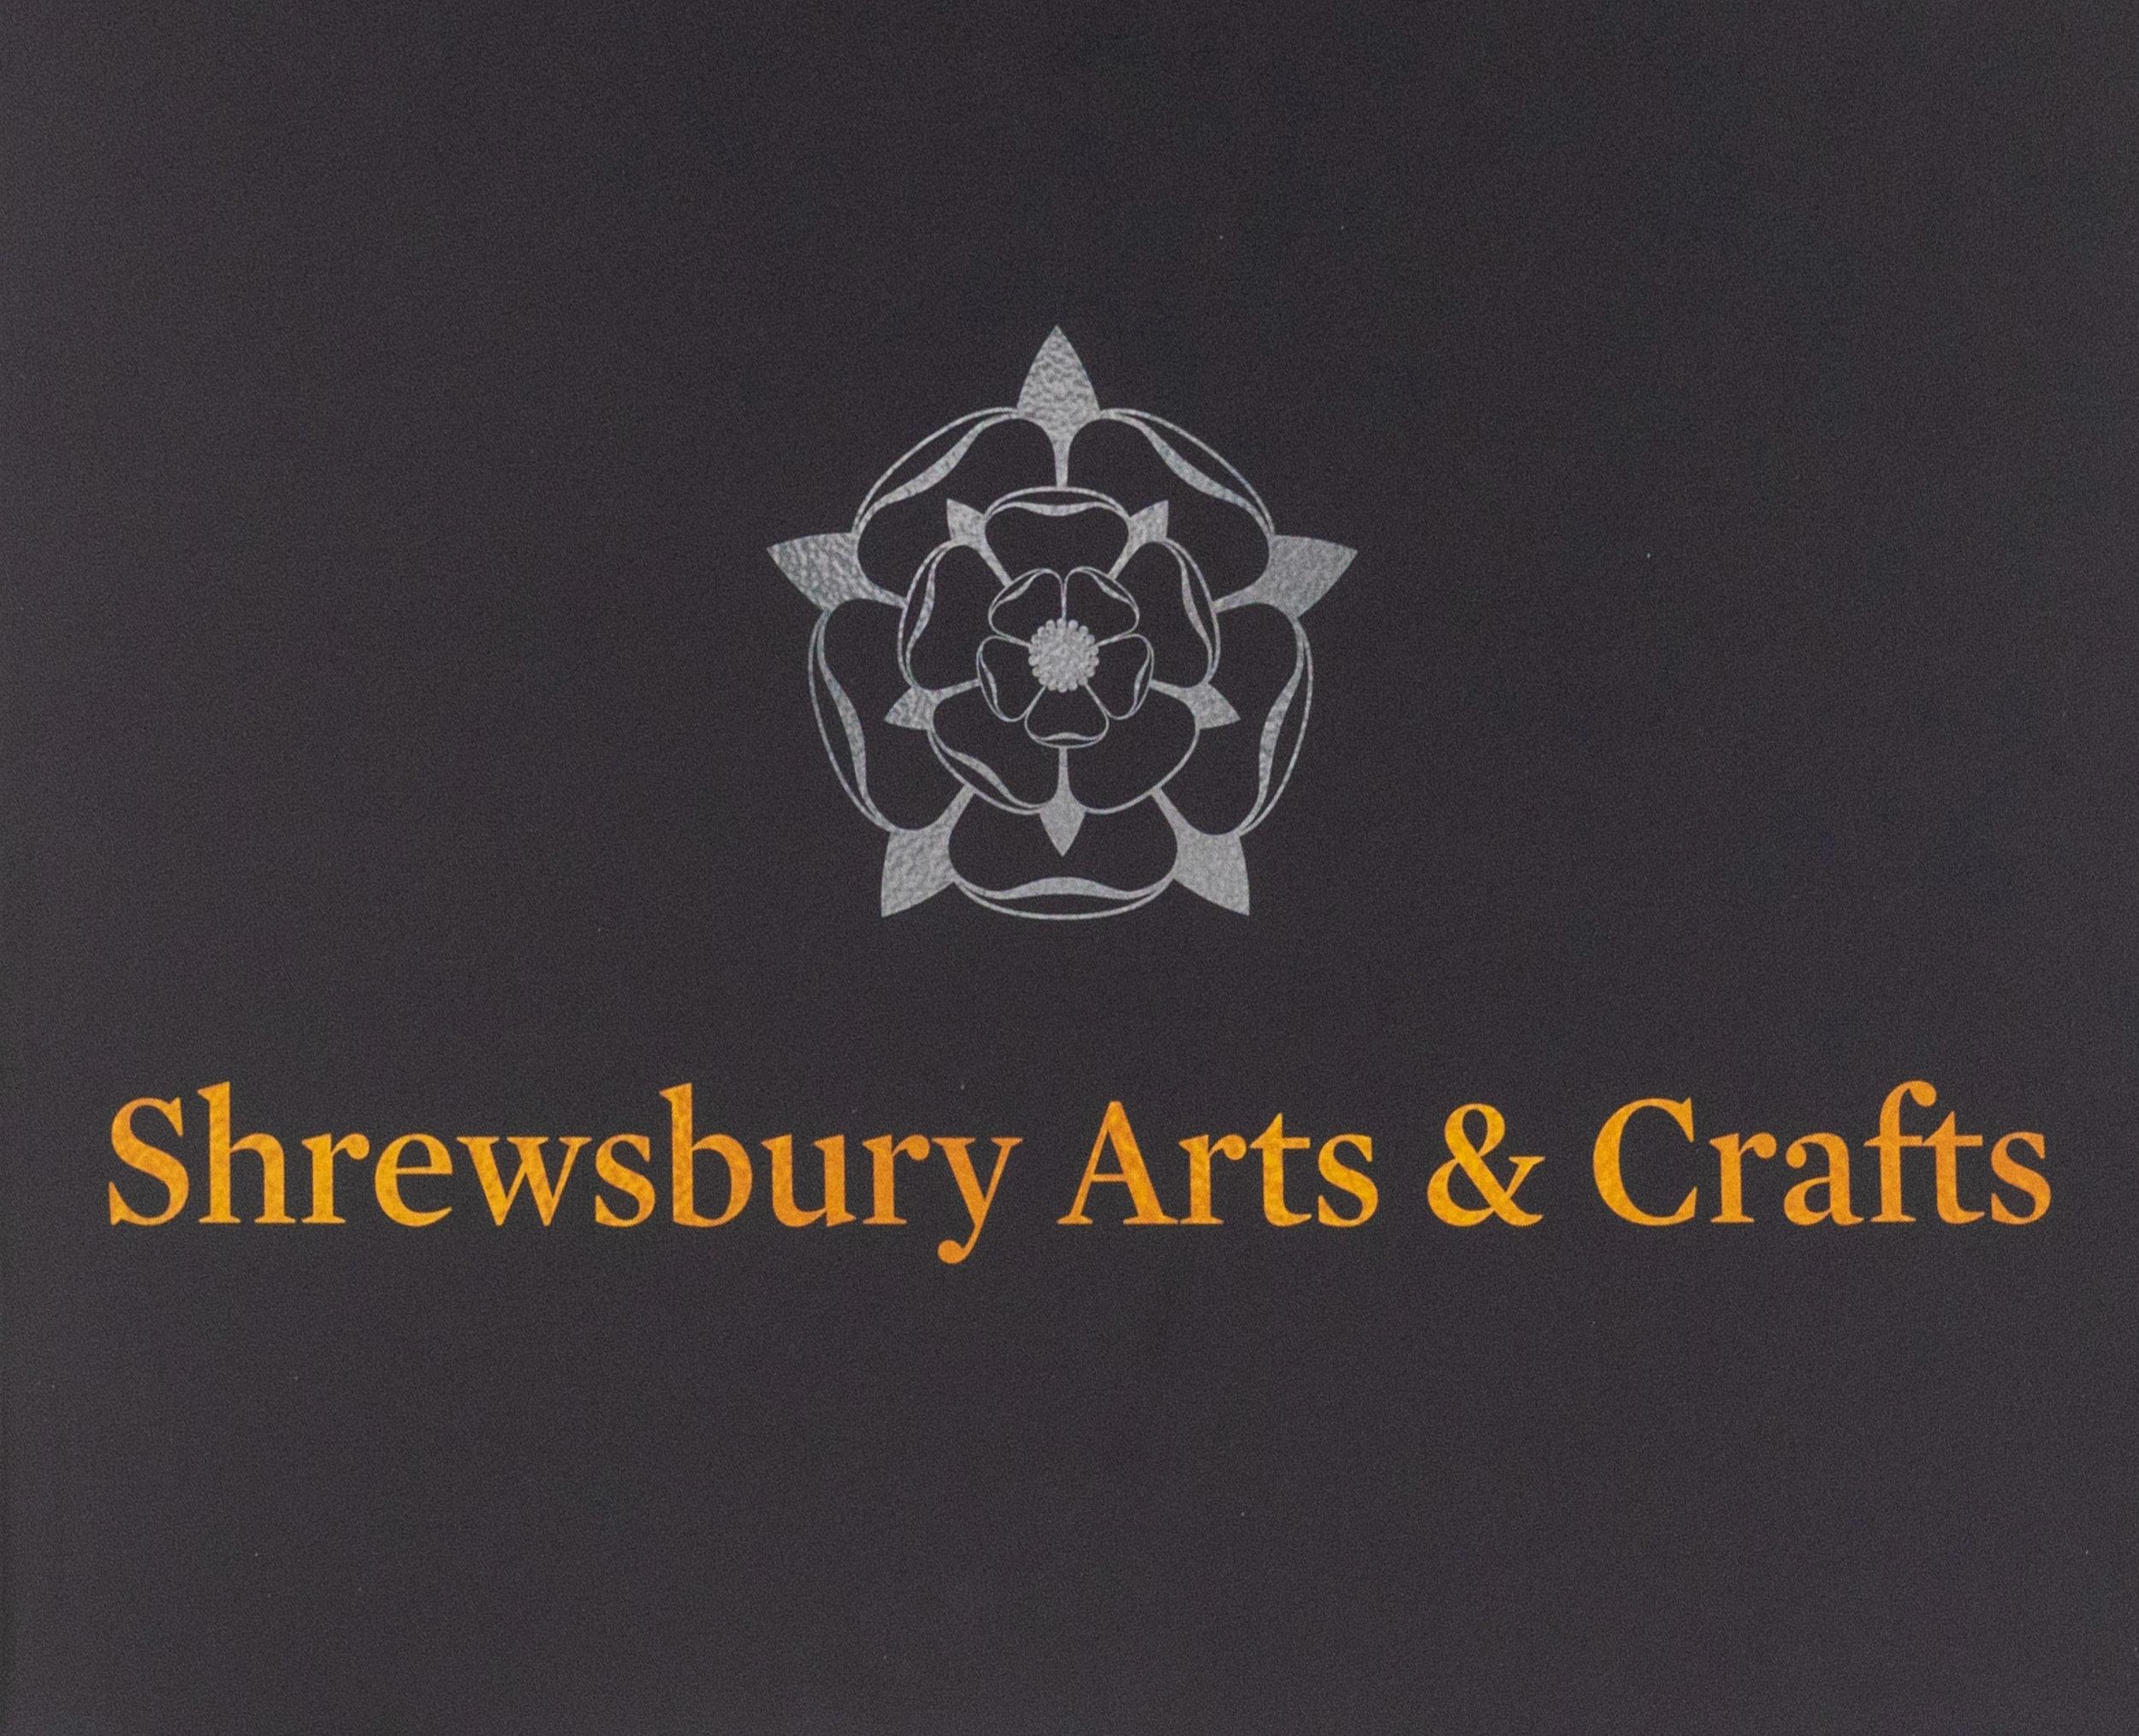 ShrewsburyArts&Crafts_Sign-9833-Edit.jpg